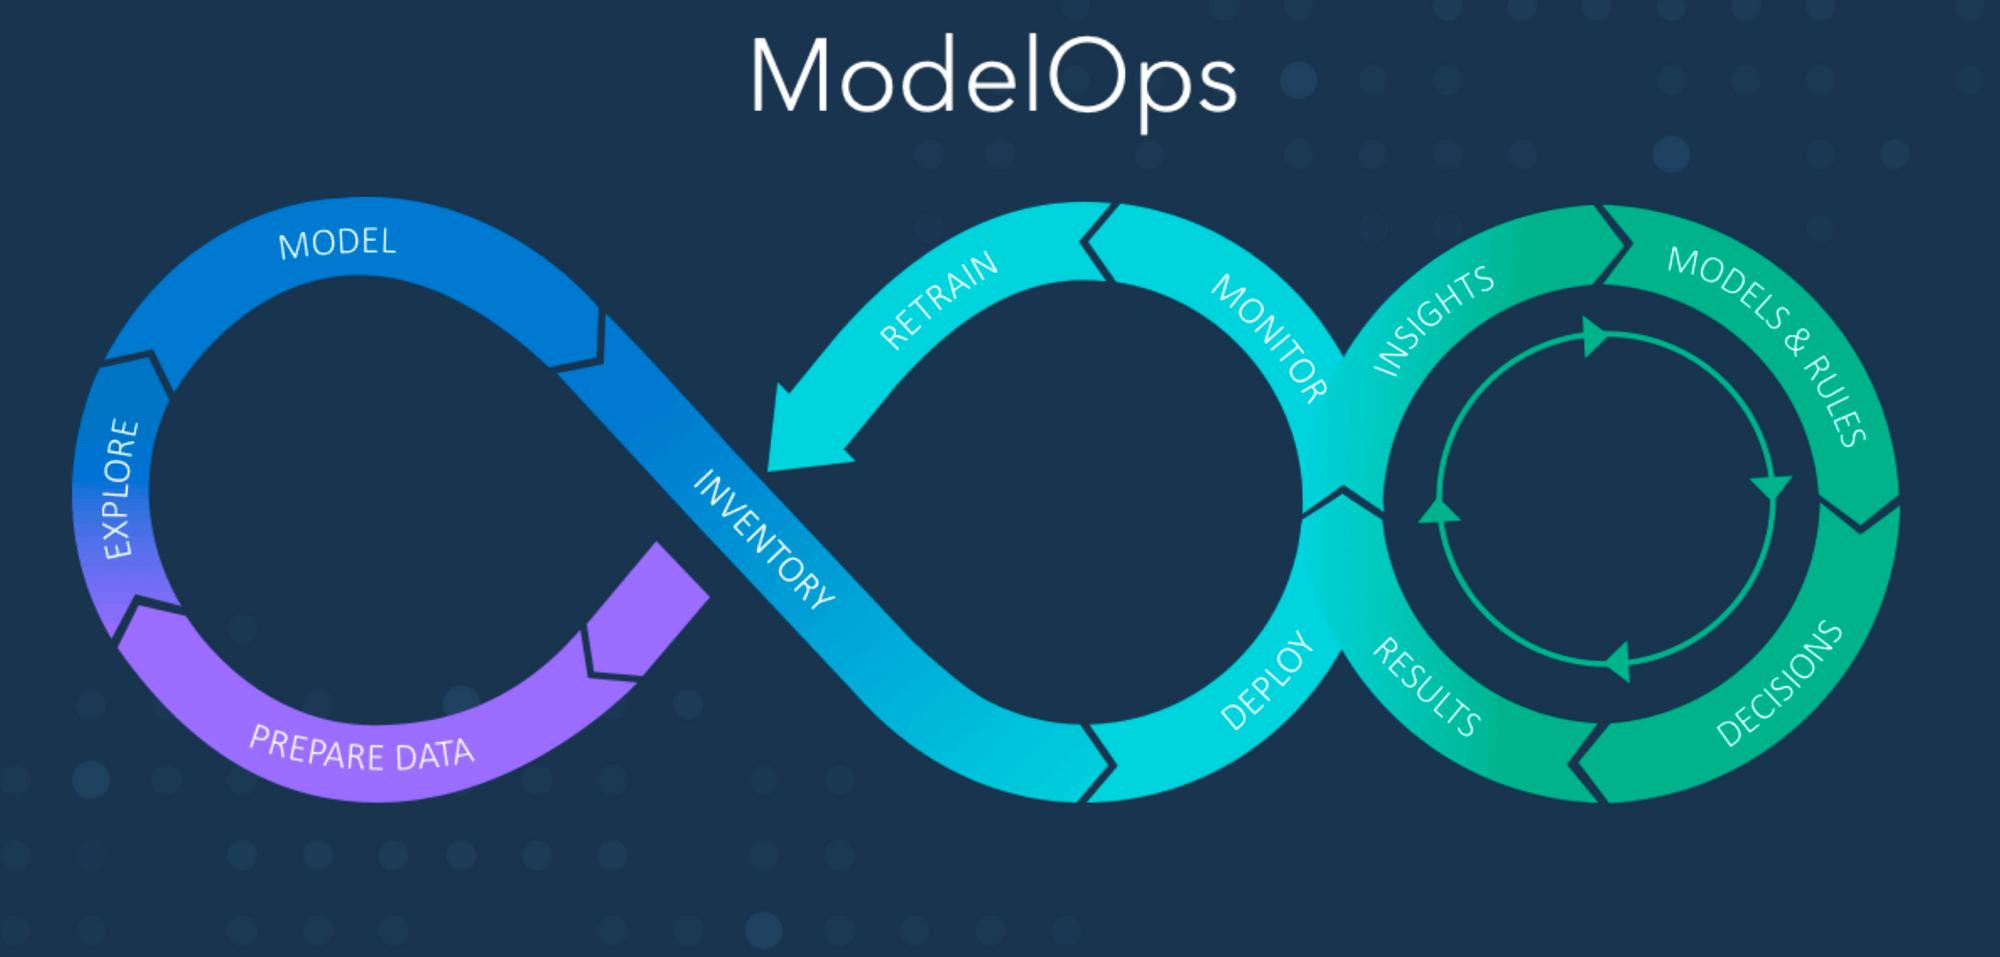 The ModelOps decision process